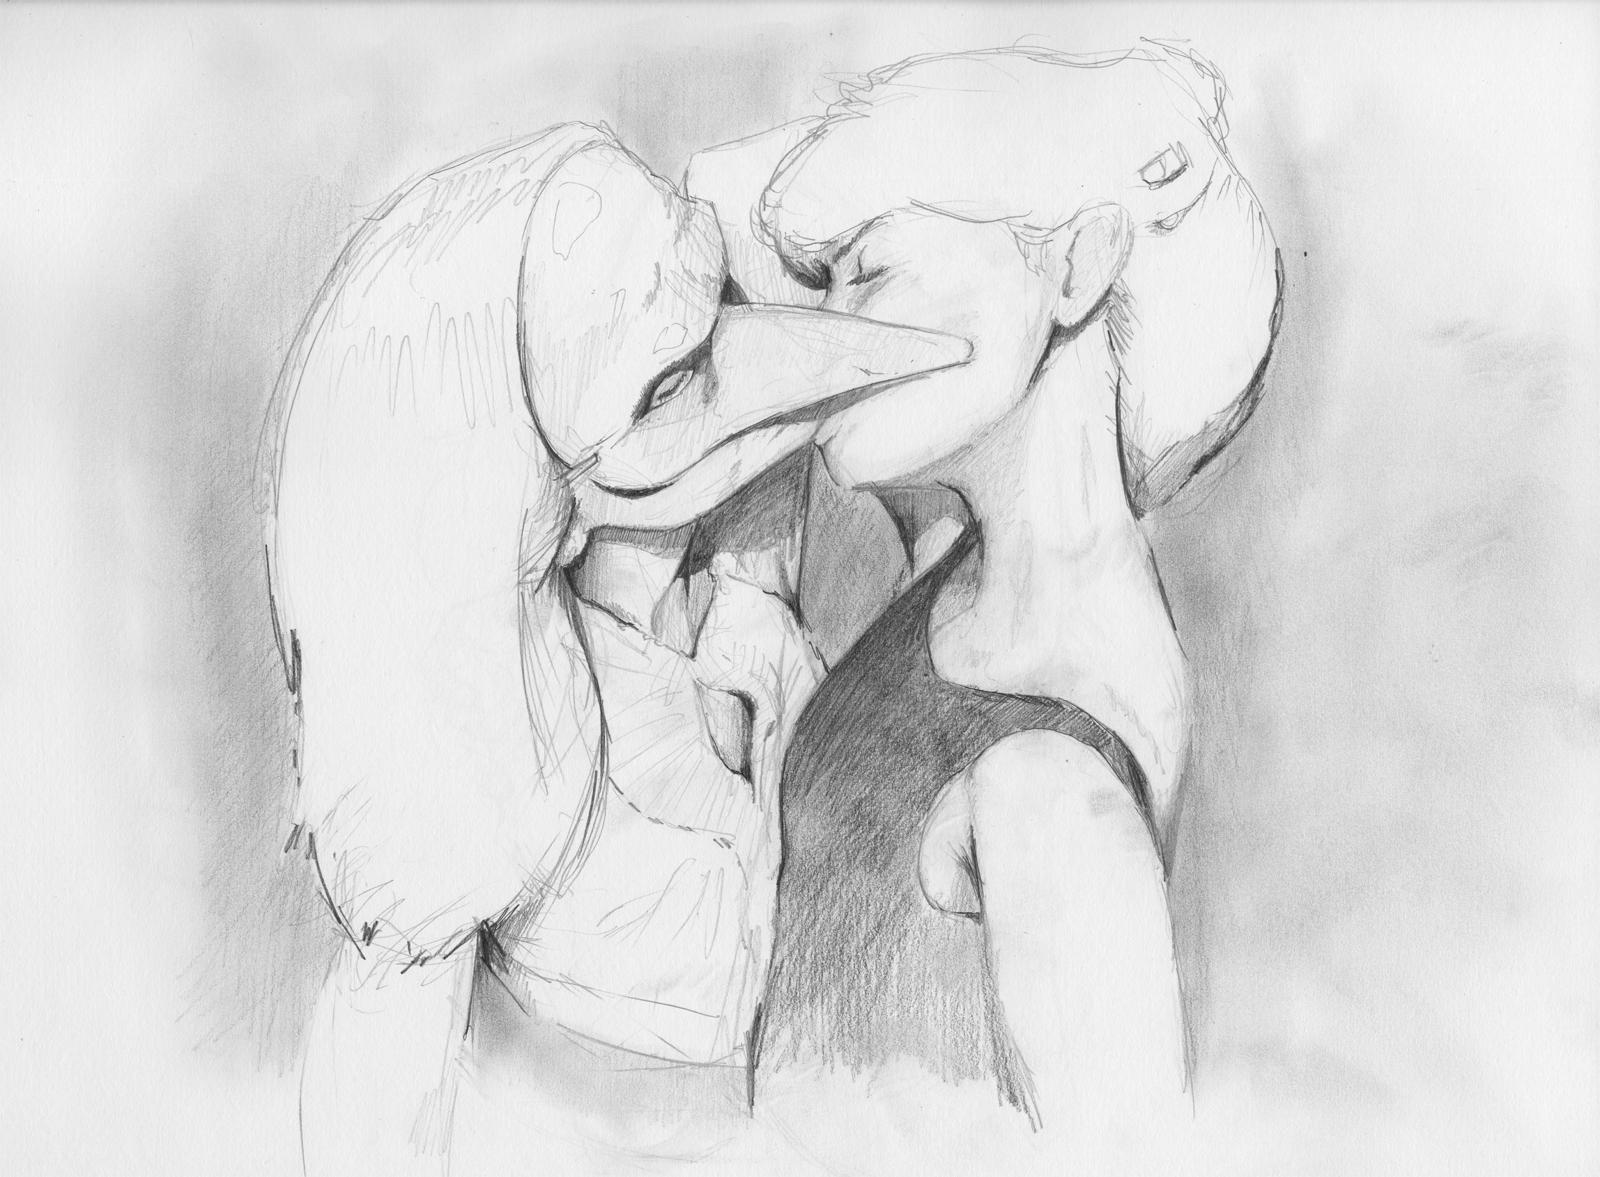 sketch-masked-kiss_david-jackowski_alvatron-studio.jpg